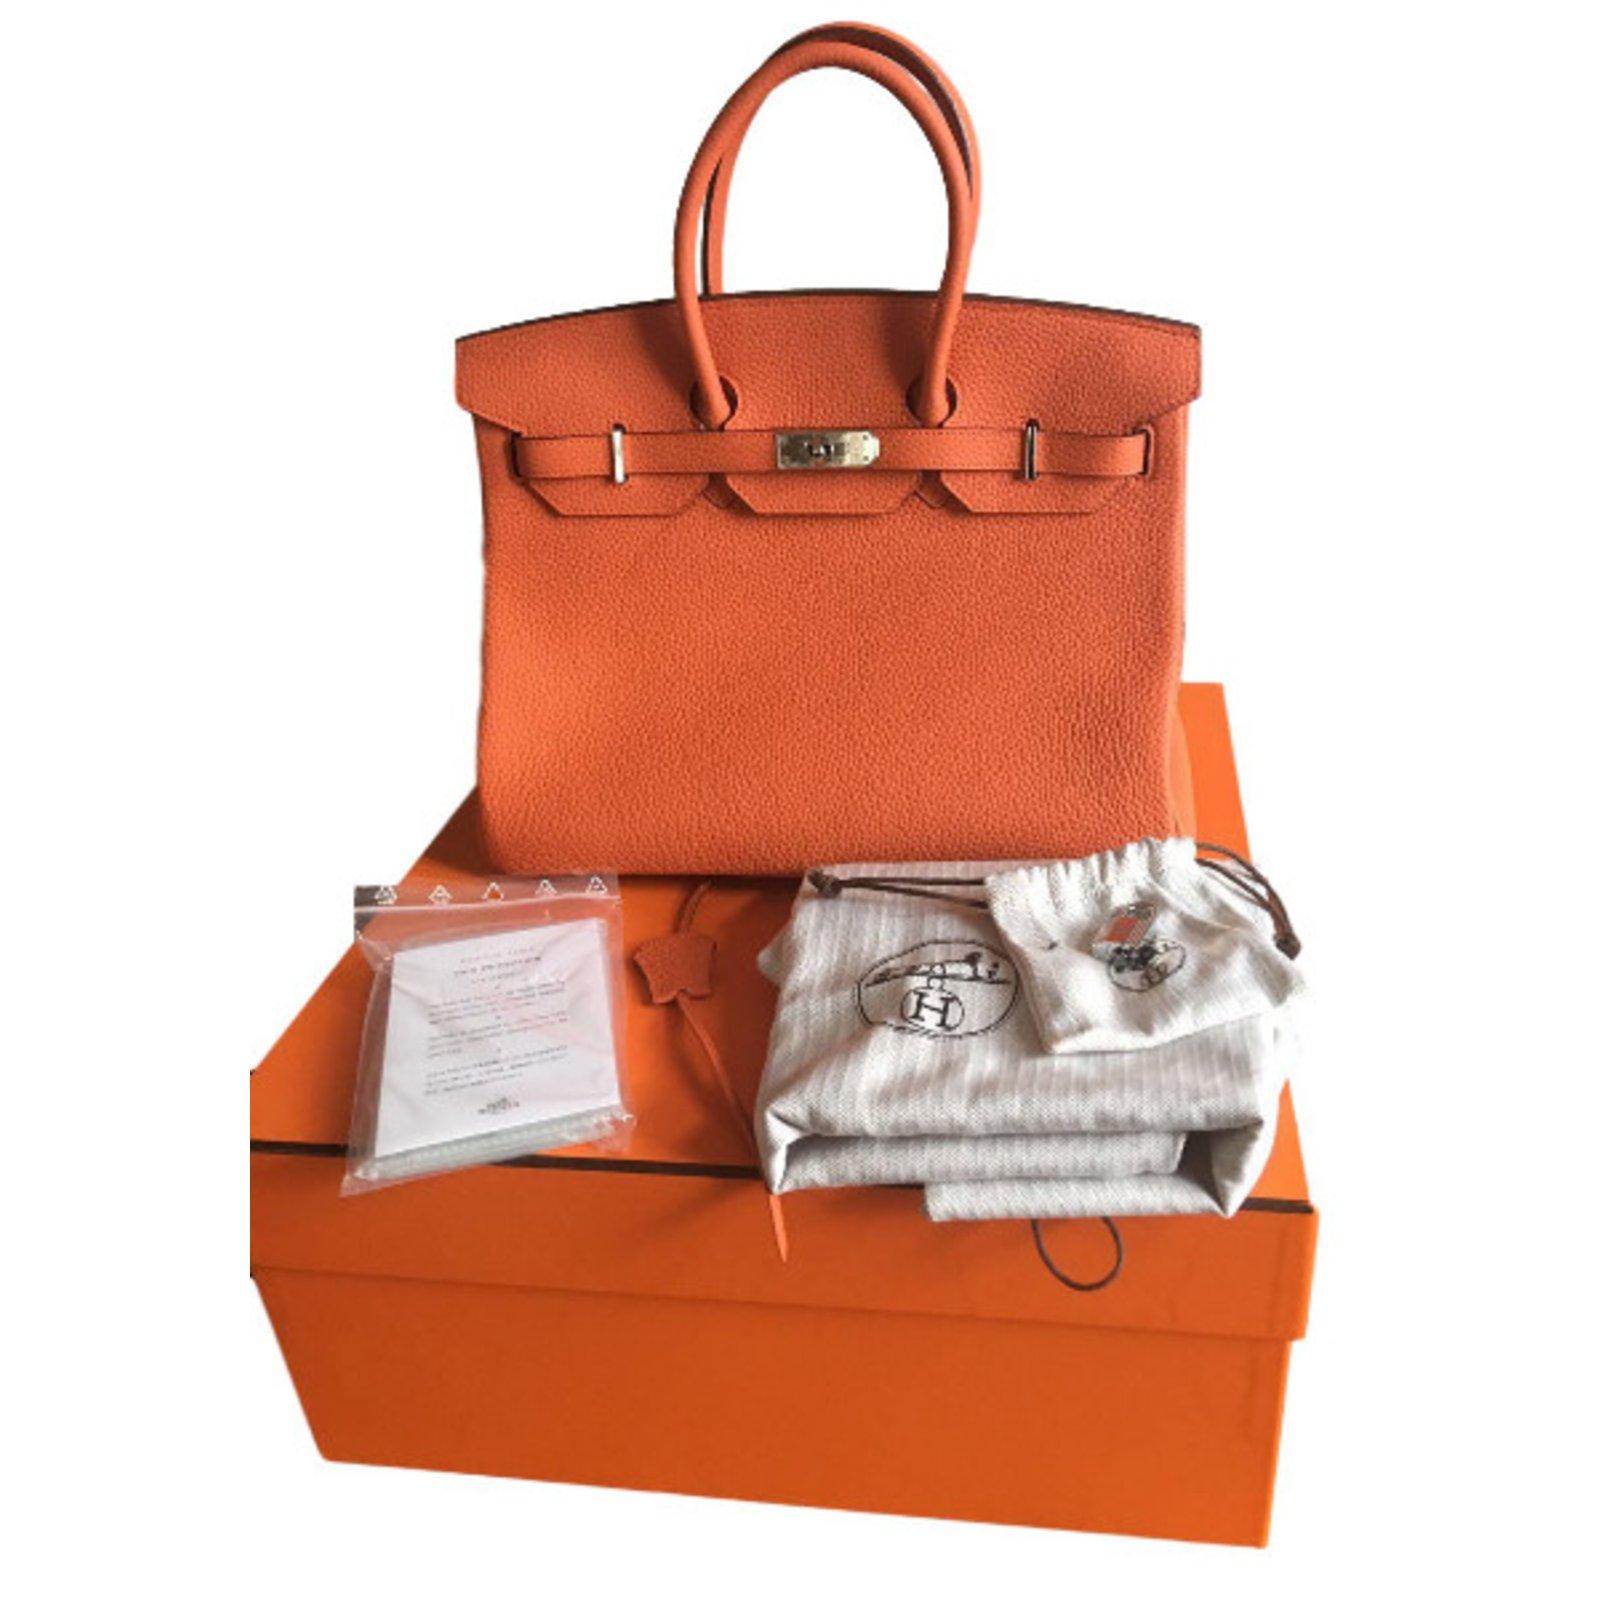 c34cfc430778 france hermes handbag paris qui 5f492 5baef